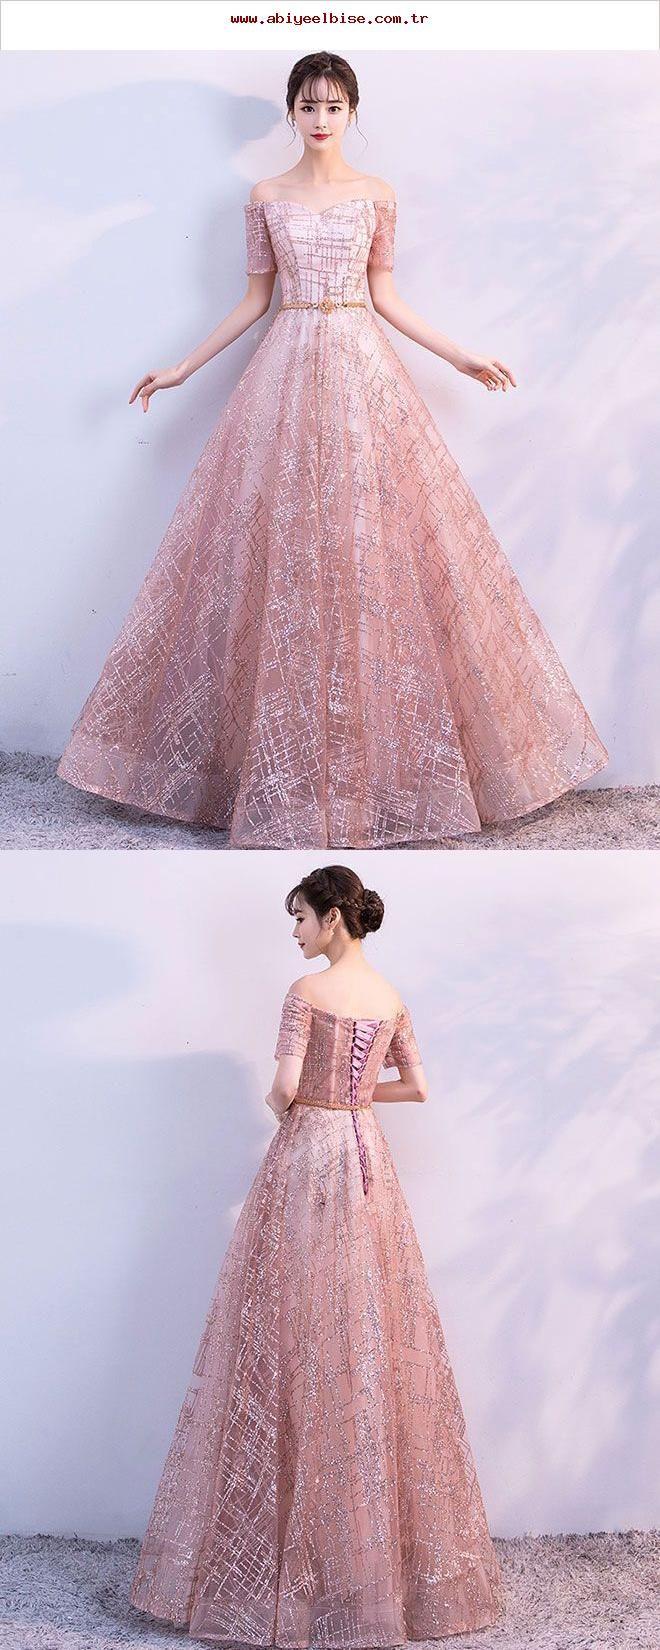 Formal Cool Tüll Abendkleid GalerieFormal Fantastisch Tüll Abendkleid Design